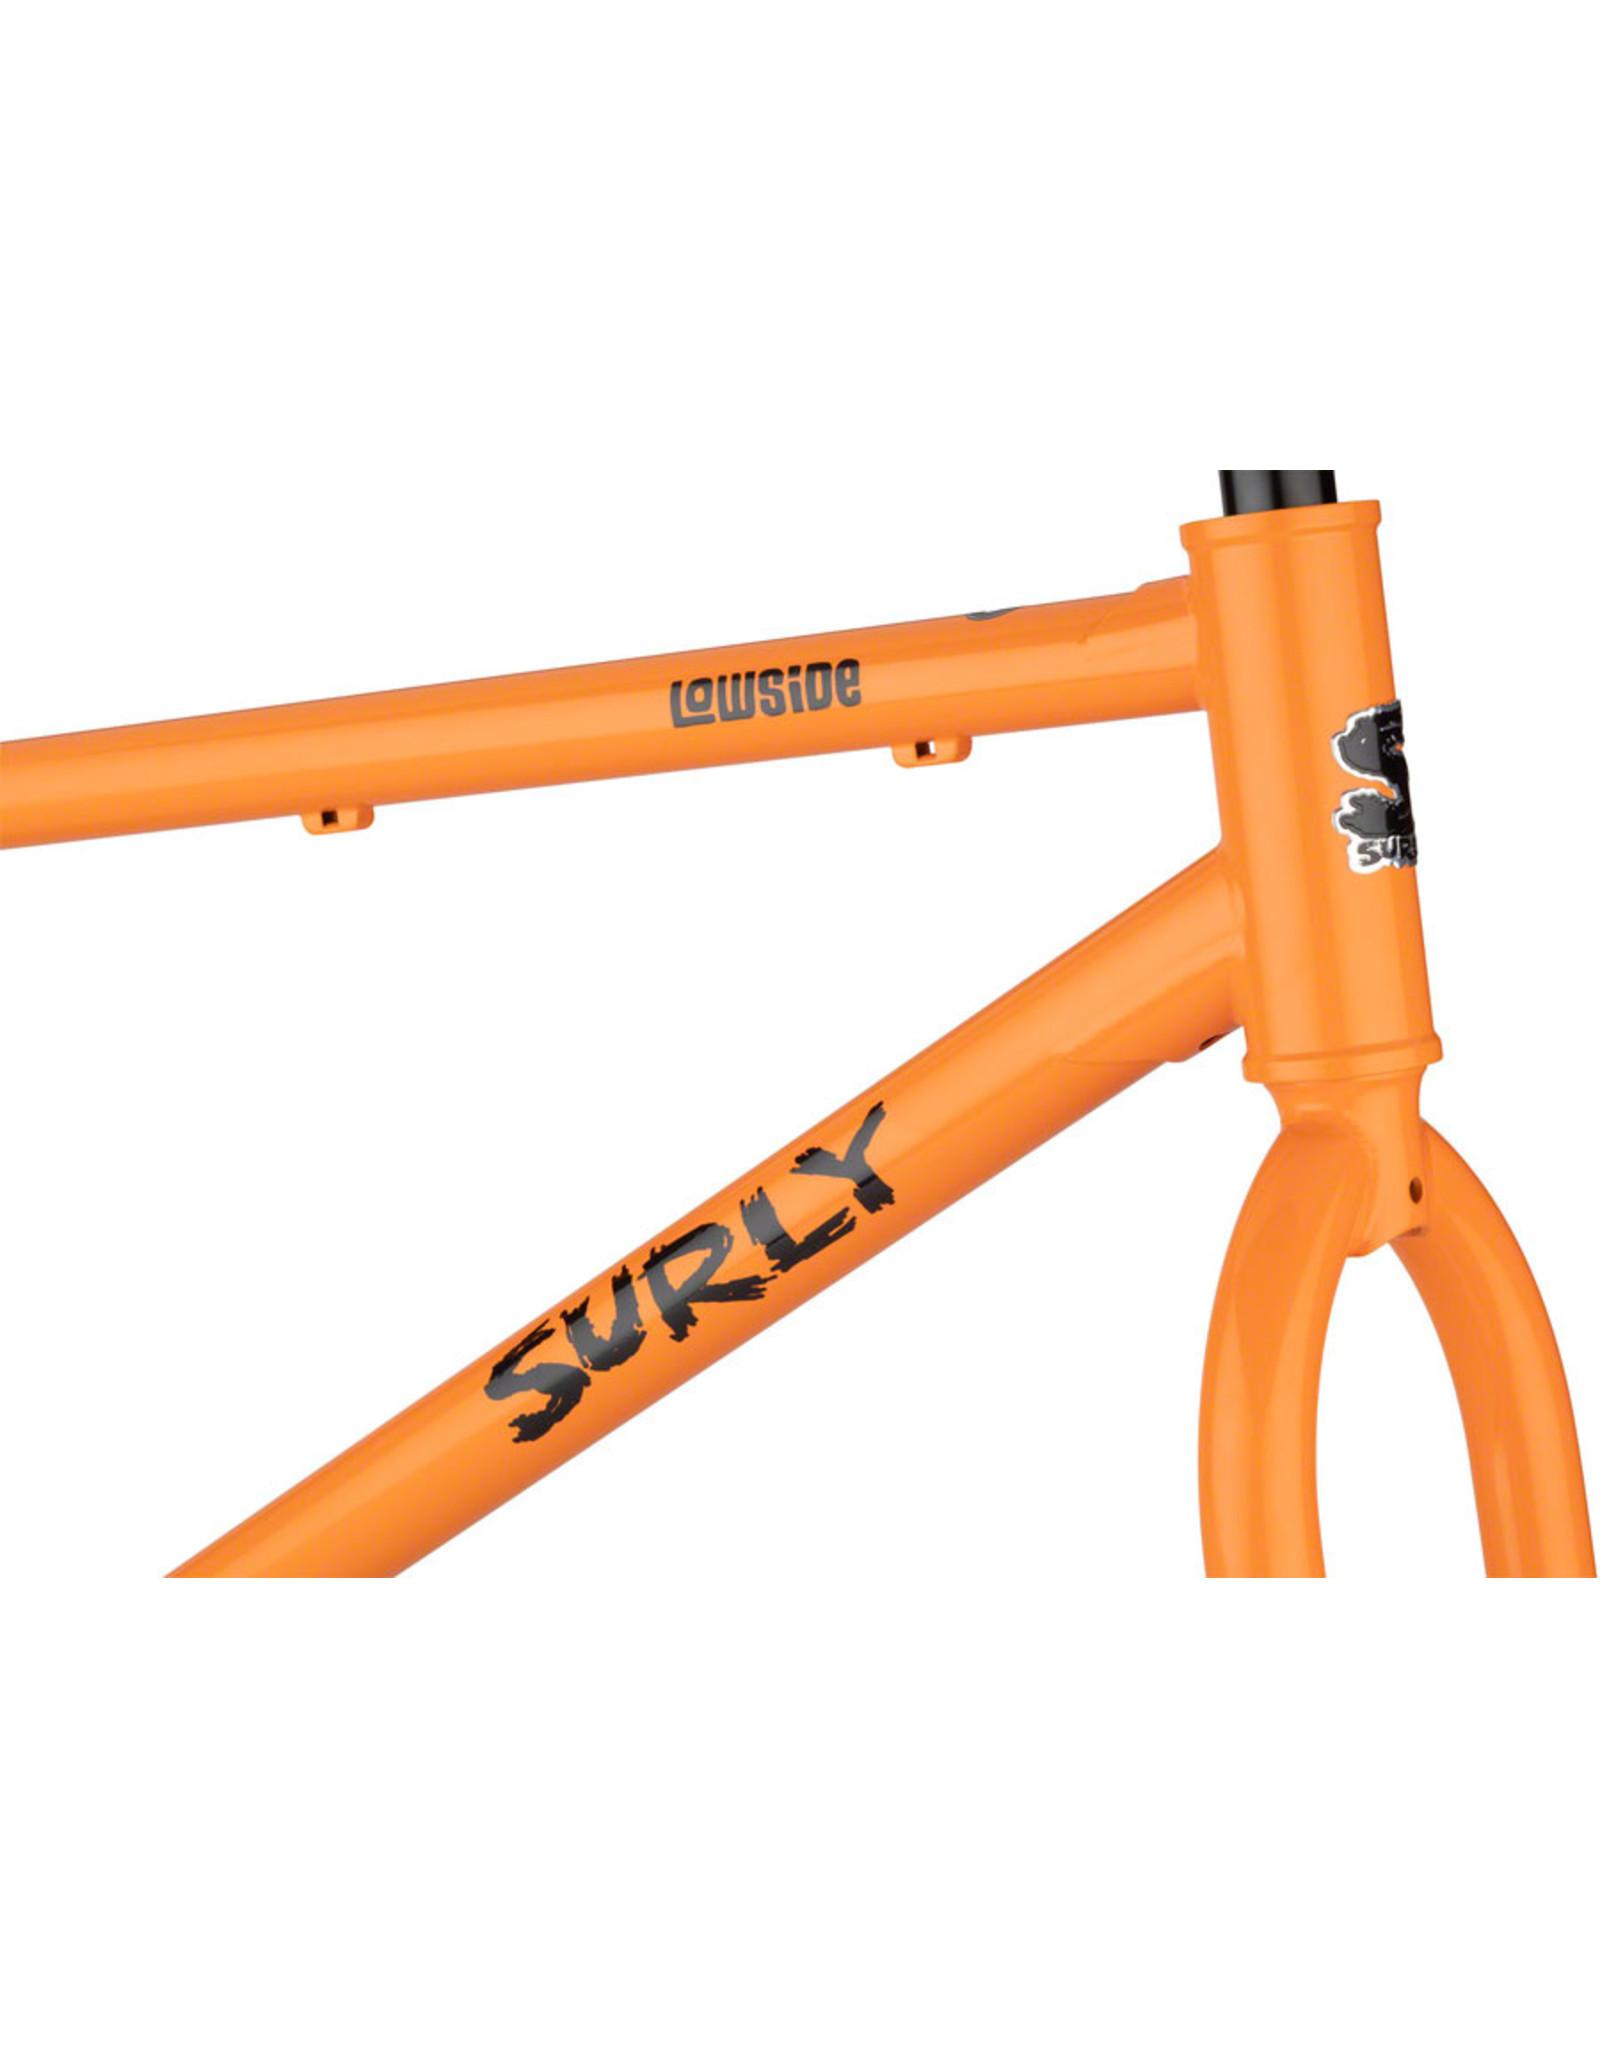 "Surly Surly Lowside Frameset - 27.5"", Steel, Dream Tangerine"